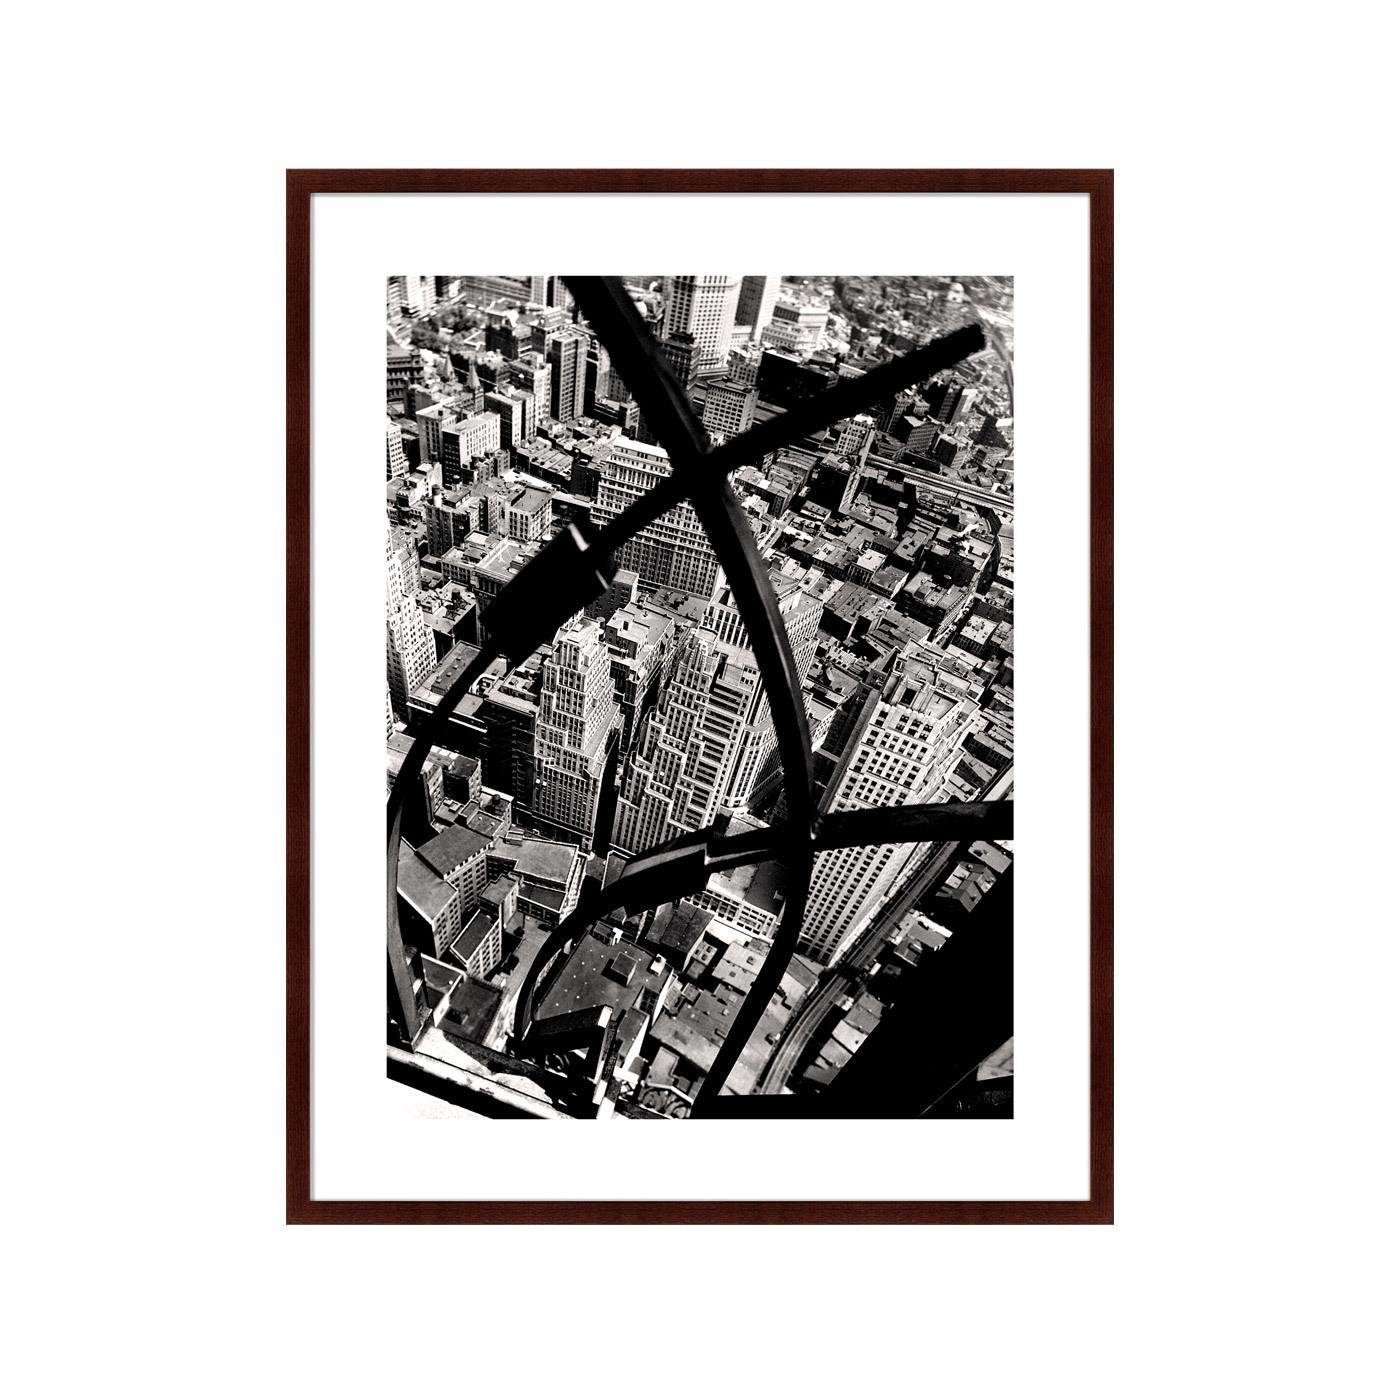 {} Картины в Квартиру Картина Улицы Нью-Йорка (102х130 см) картины в квартиру картина вода деревья утро 102х130 см